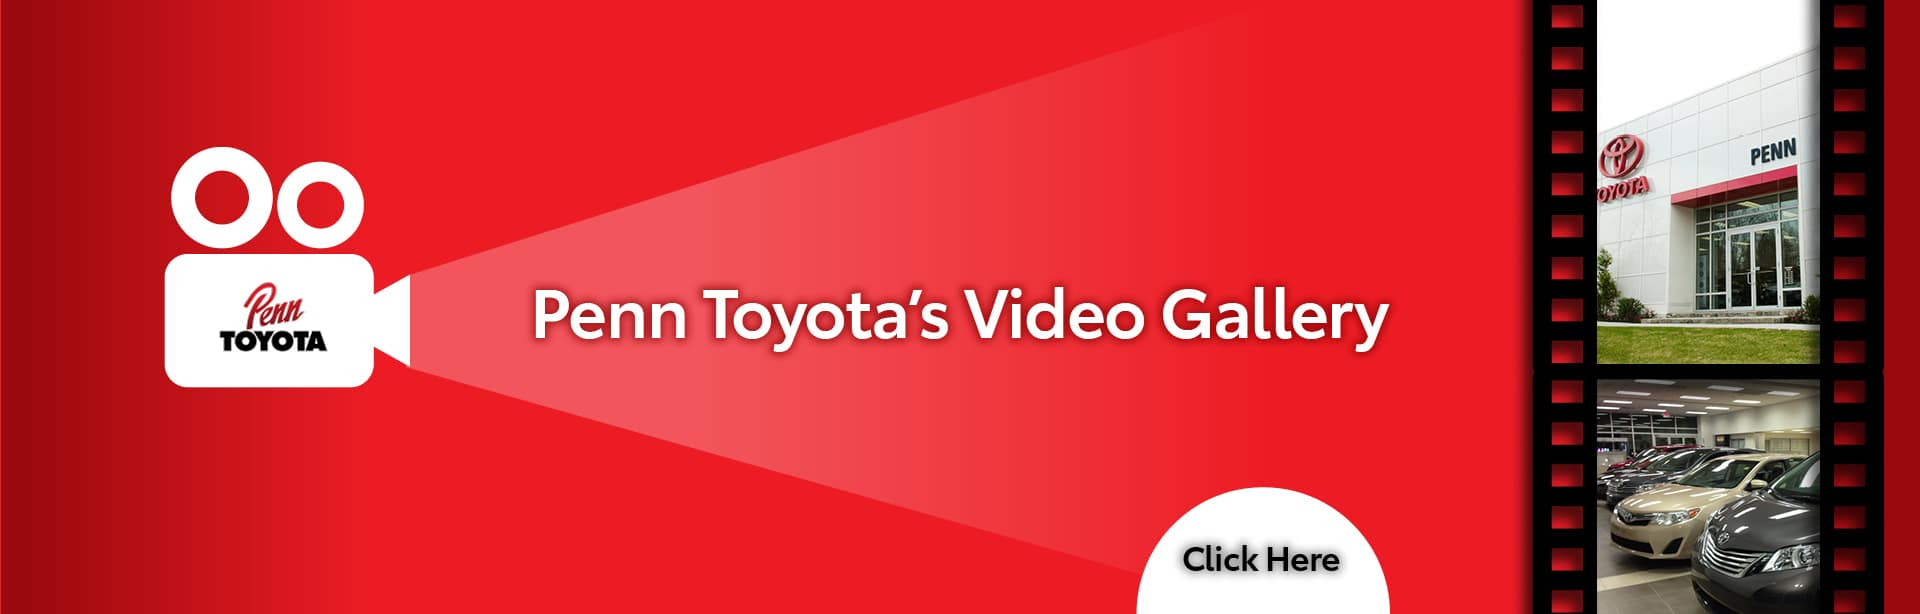 Penn Toyota Video Gallery